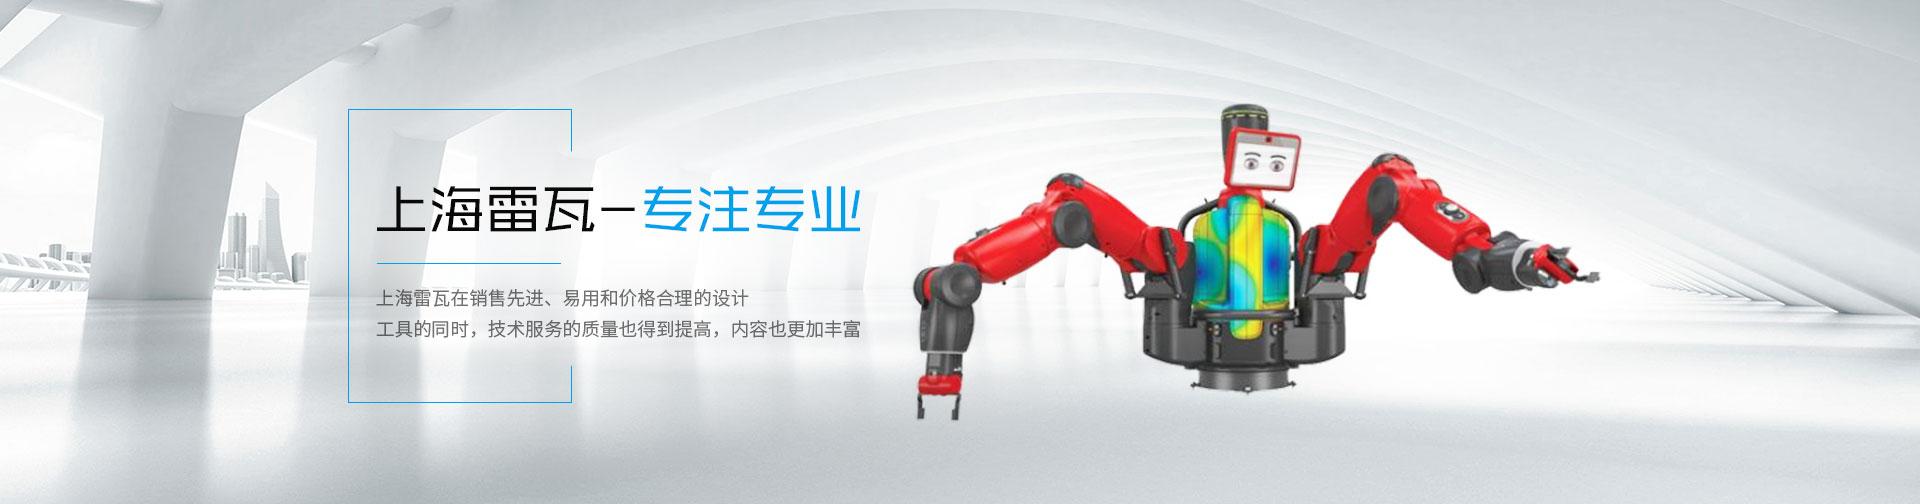 SolidWorks价格